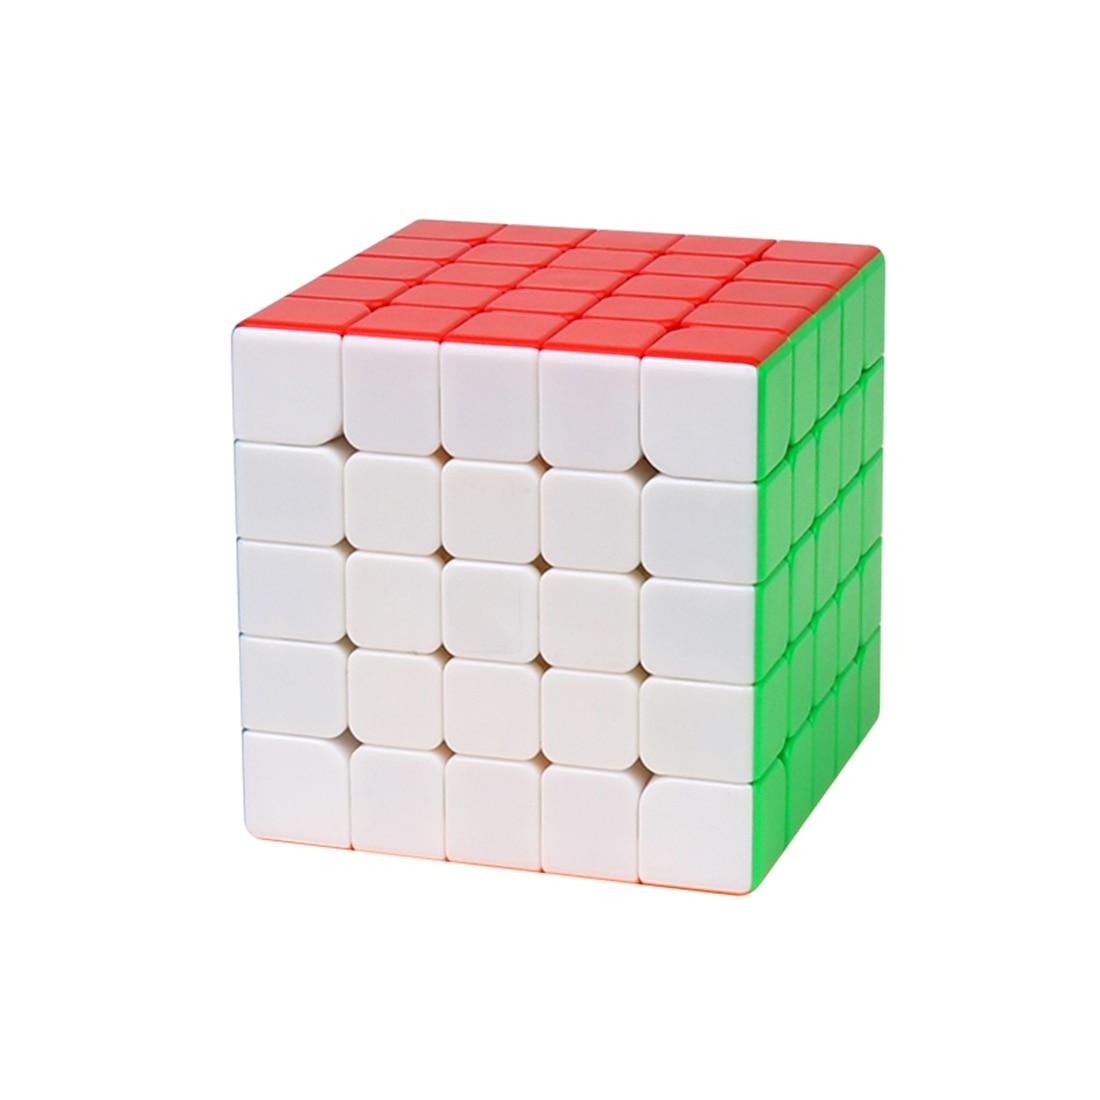 MoYu de Aochuang WR M 5x5x5 cubo mágico profesional juego de Puzzle de juguetes educativos-Stickerless mejor magnético versión